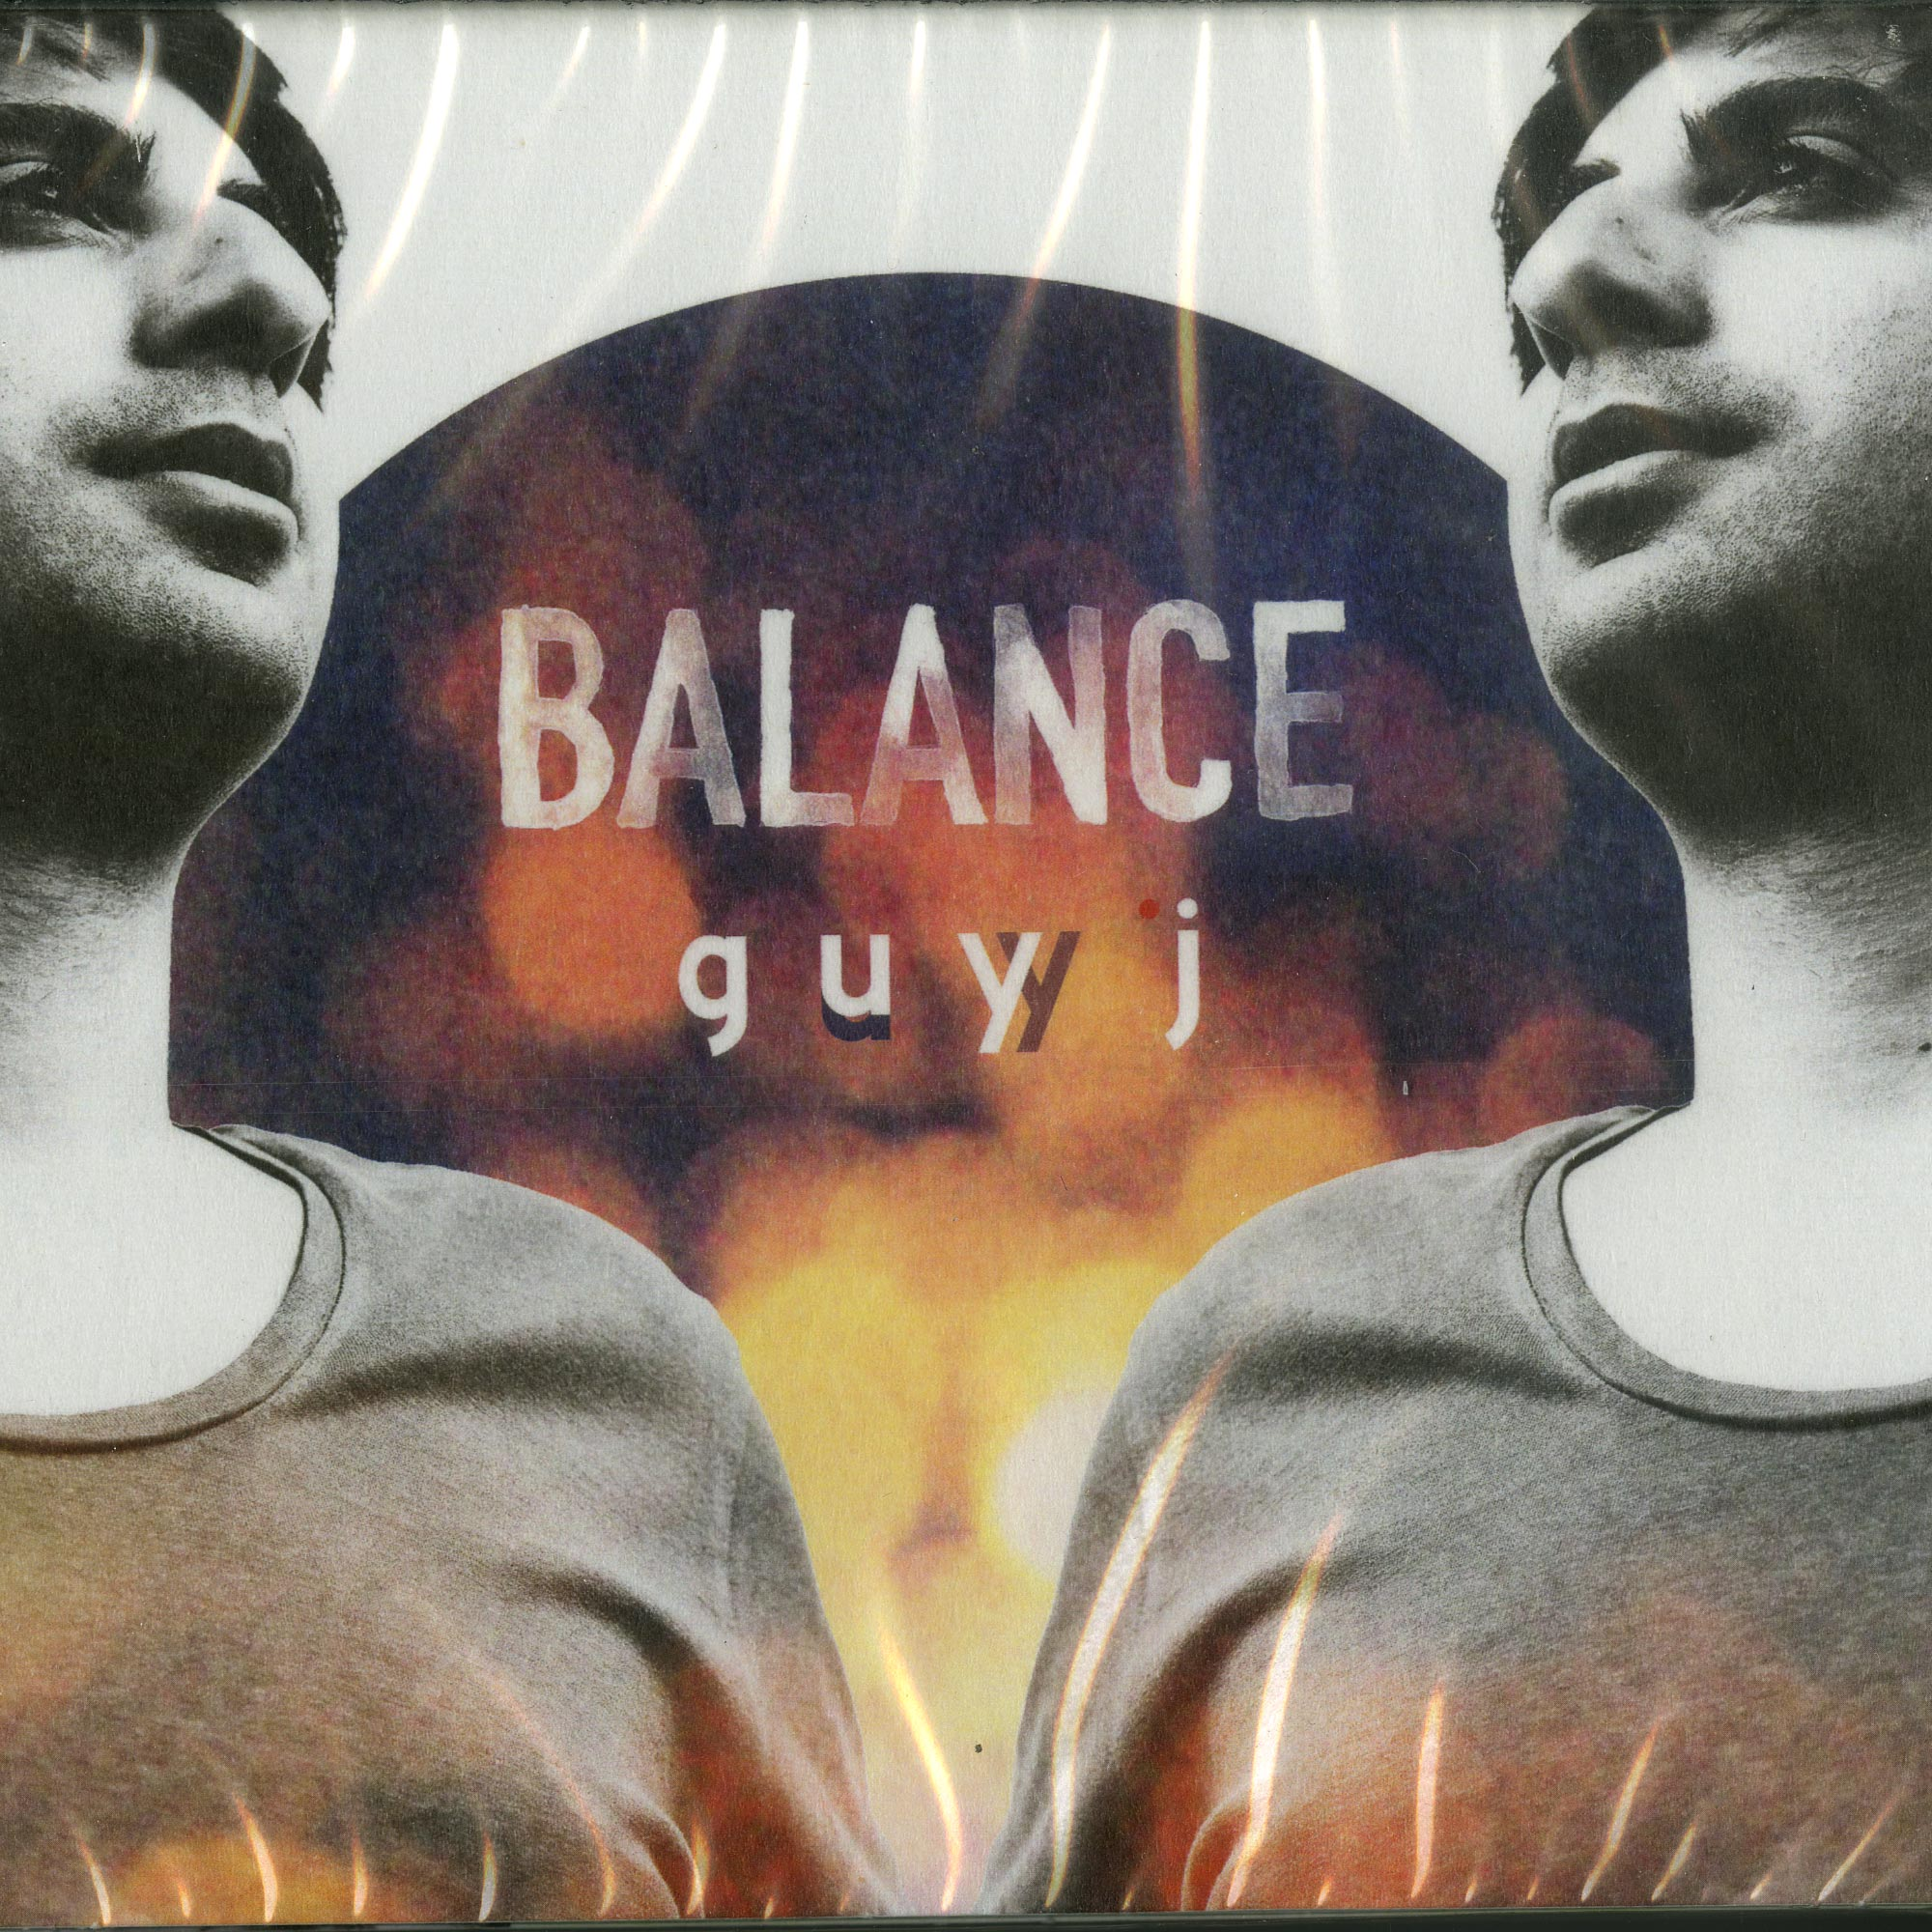 Guy J - BALANCE